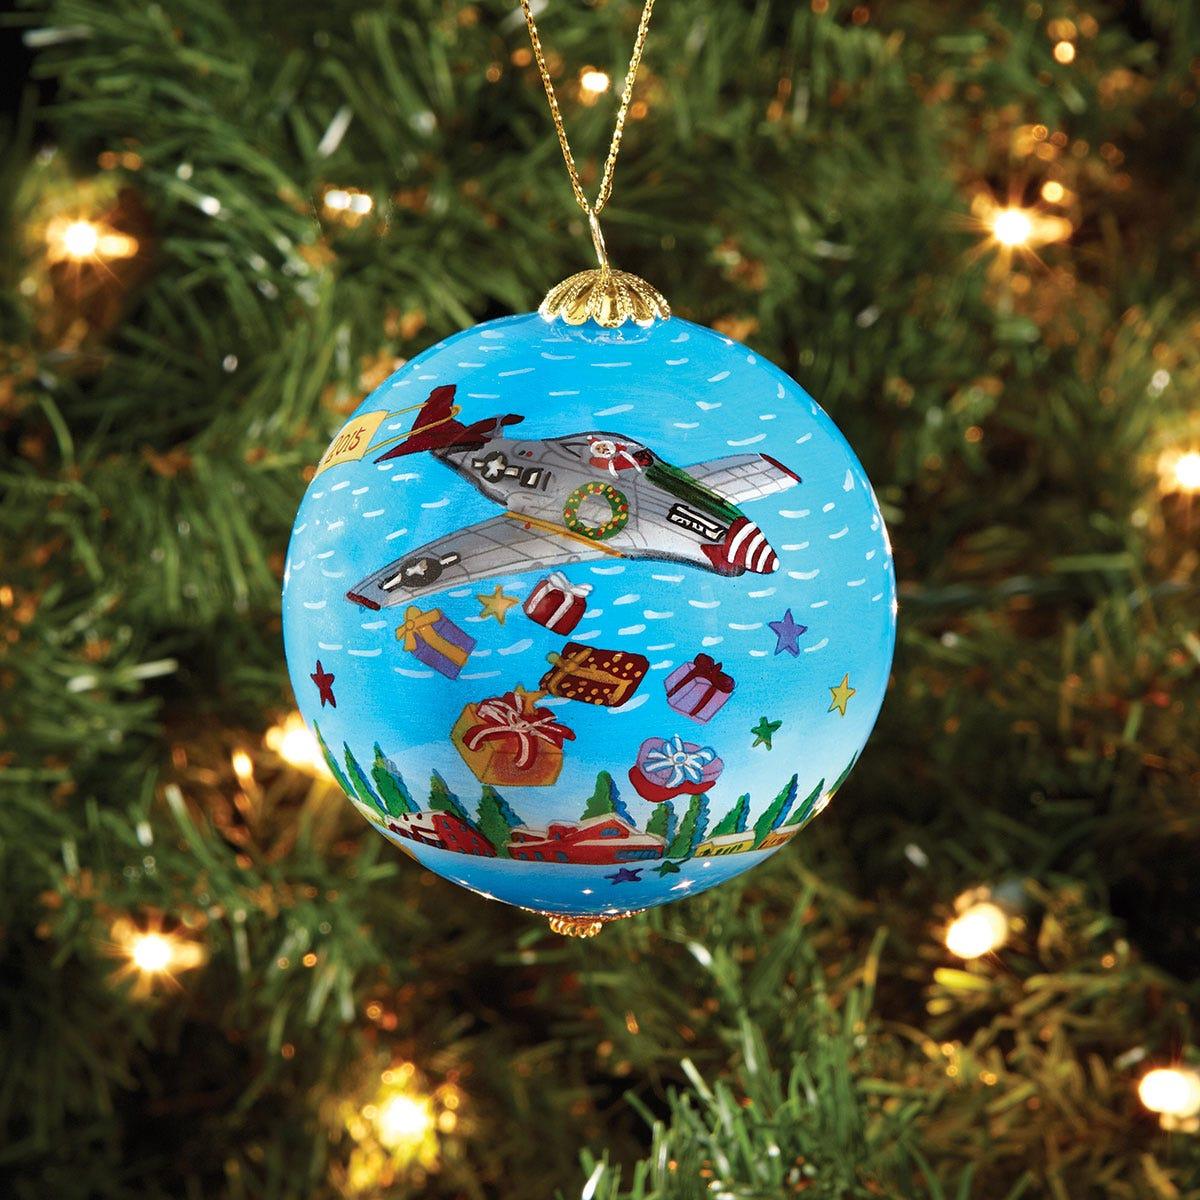 Colorado Christmas Ornaments Part - 39: More Photos